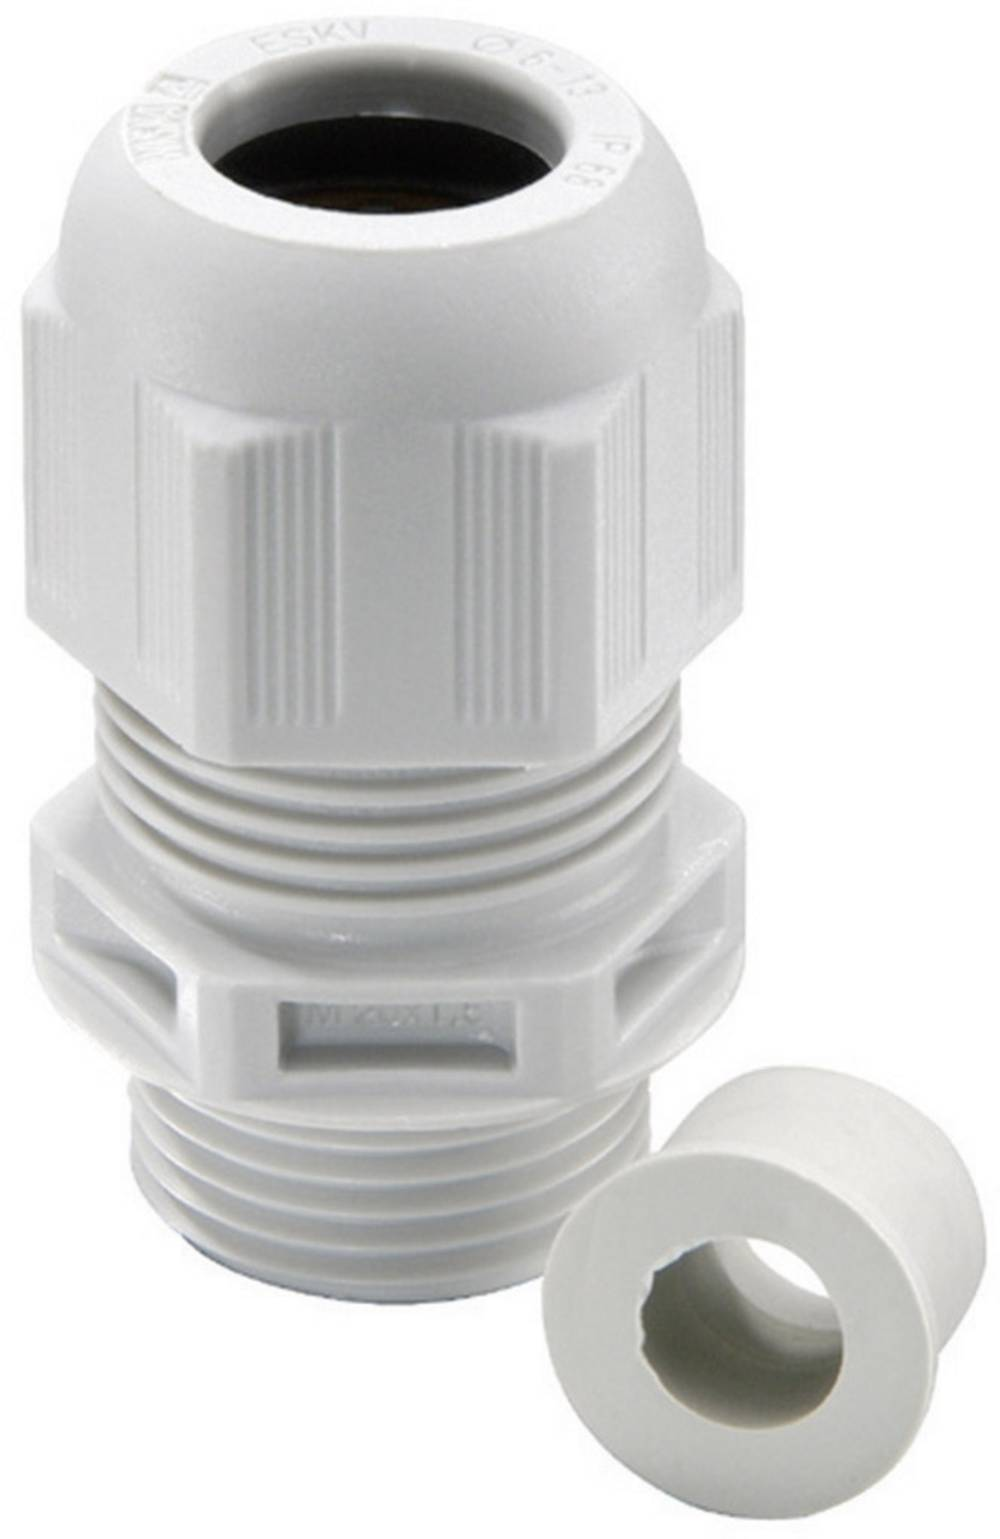 Kabelska uvodnica M20 poliamid, svetlo sive barve (RAL 7035) Wiska ESKV-RDE 20 50 kosov